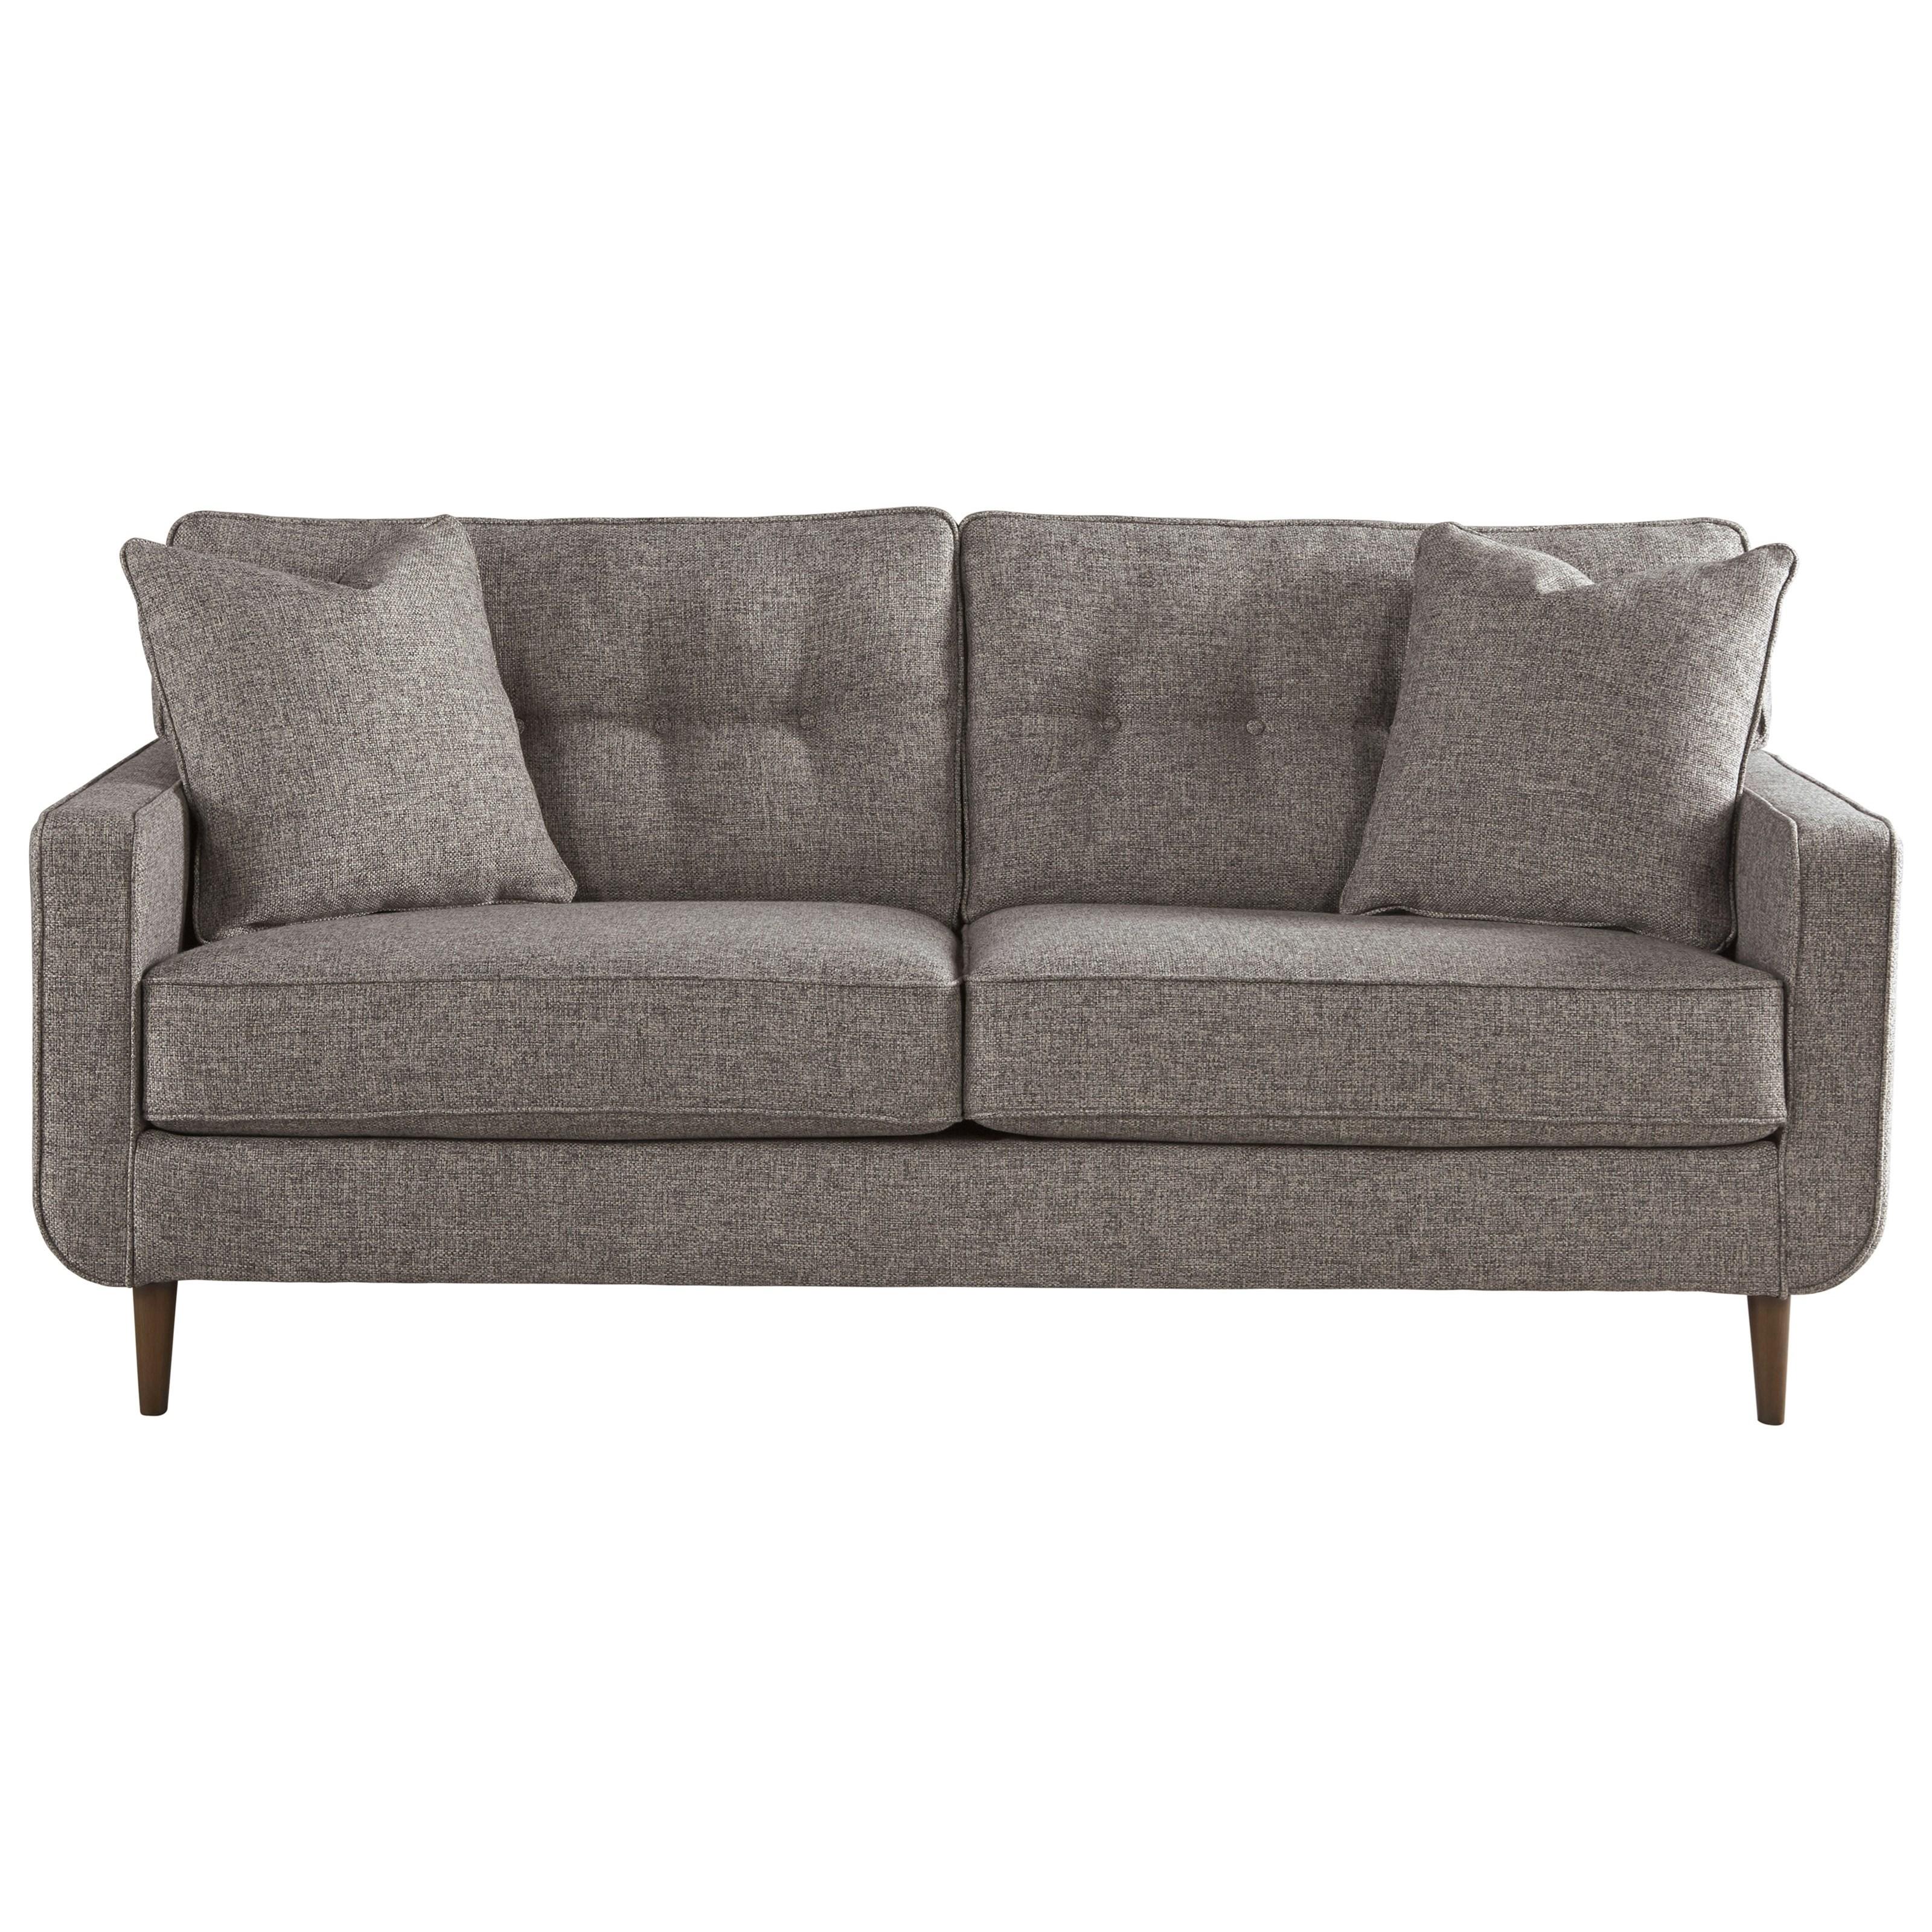 Ashley Sofa Furniture Best Furniture Mentor Oh Ashley